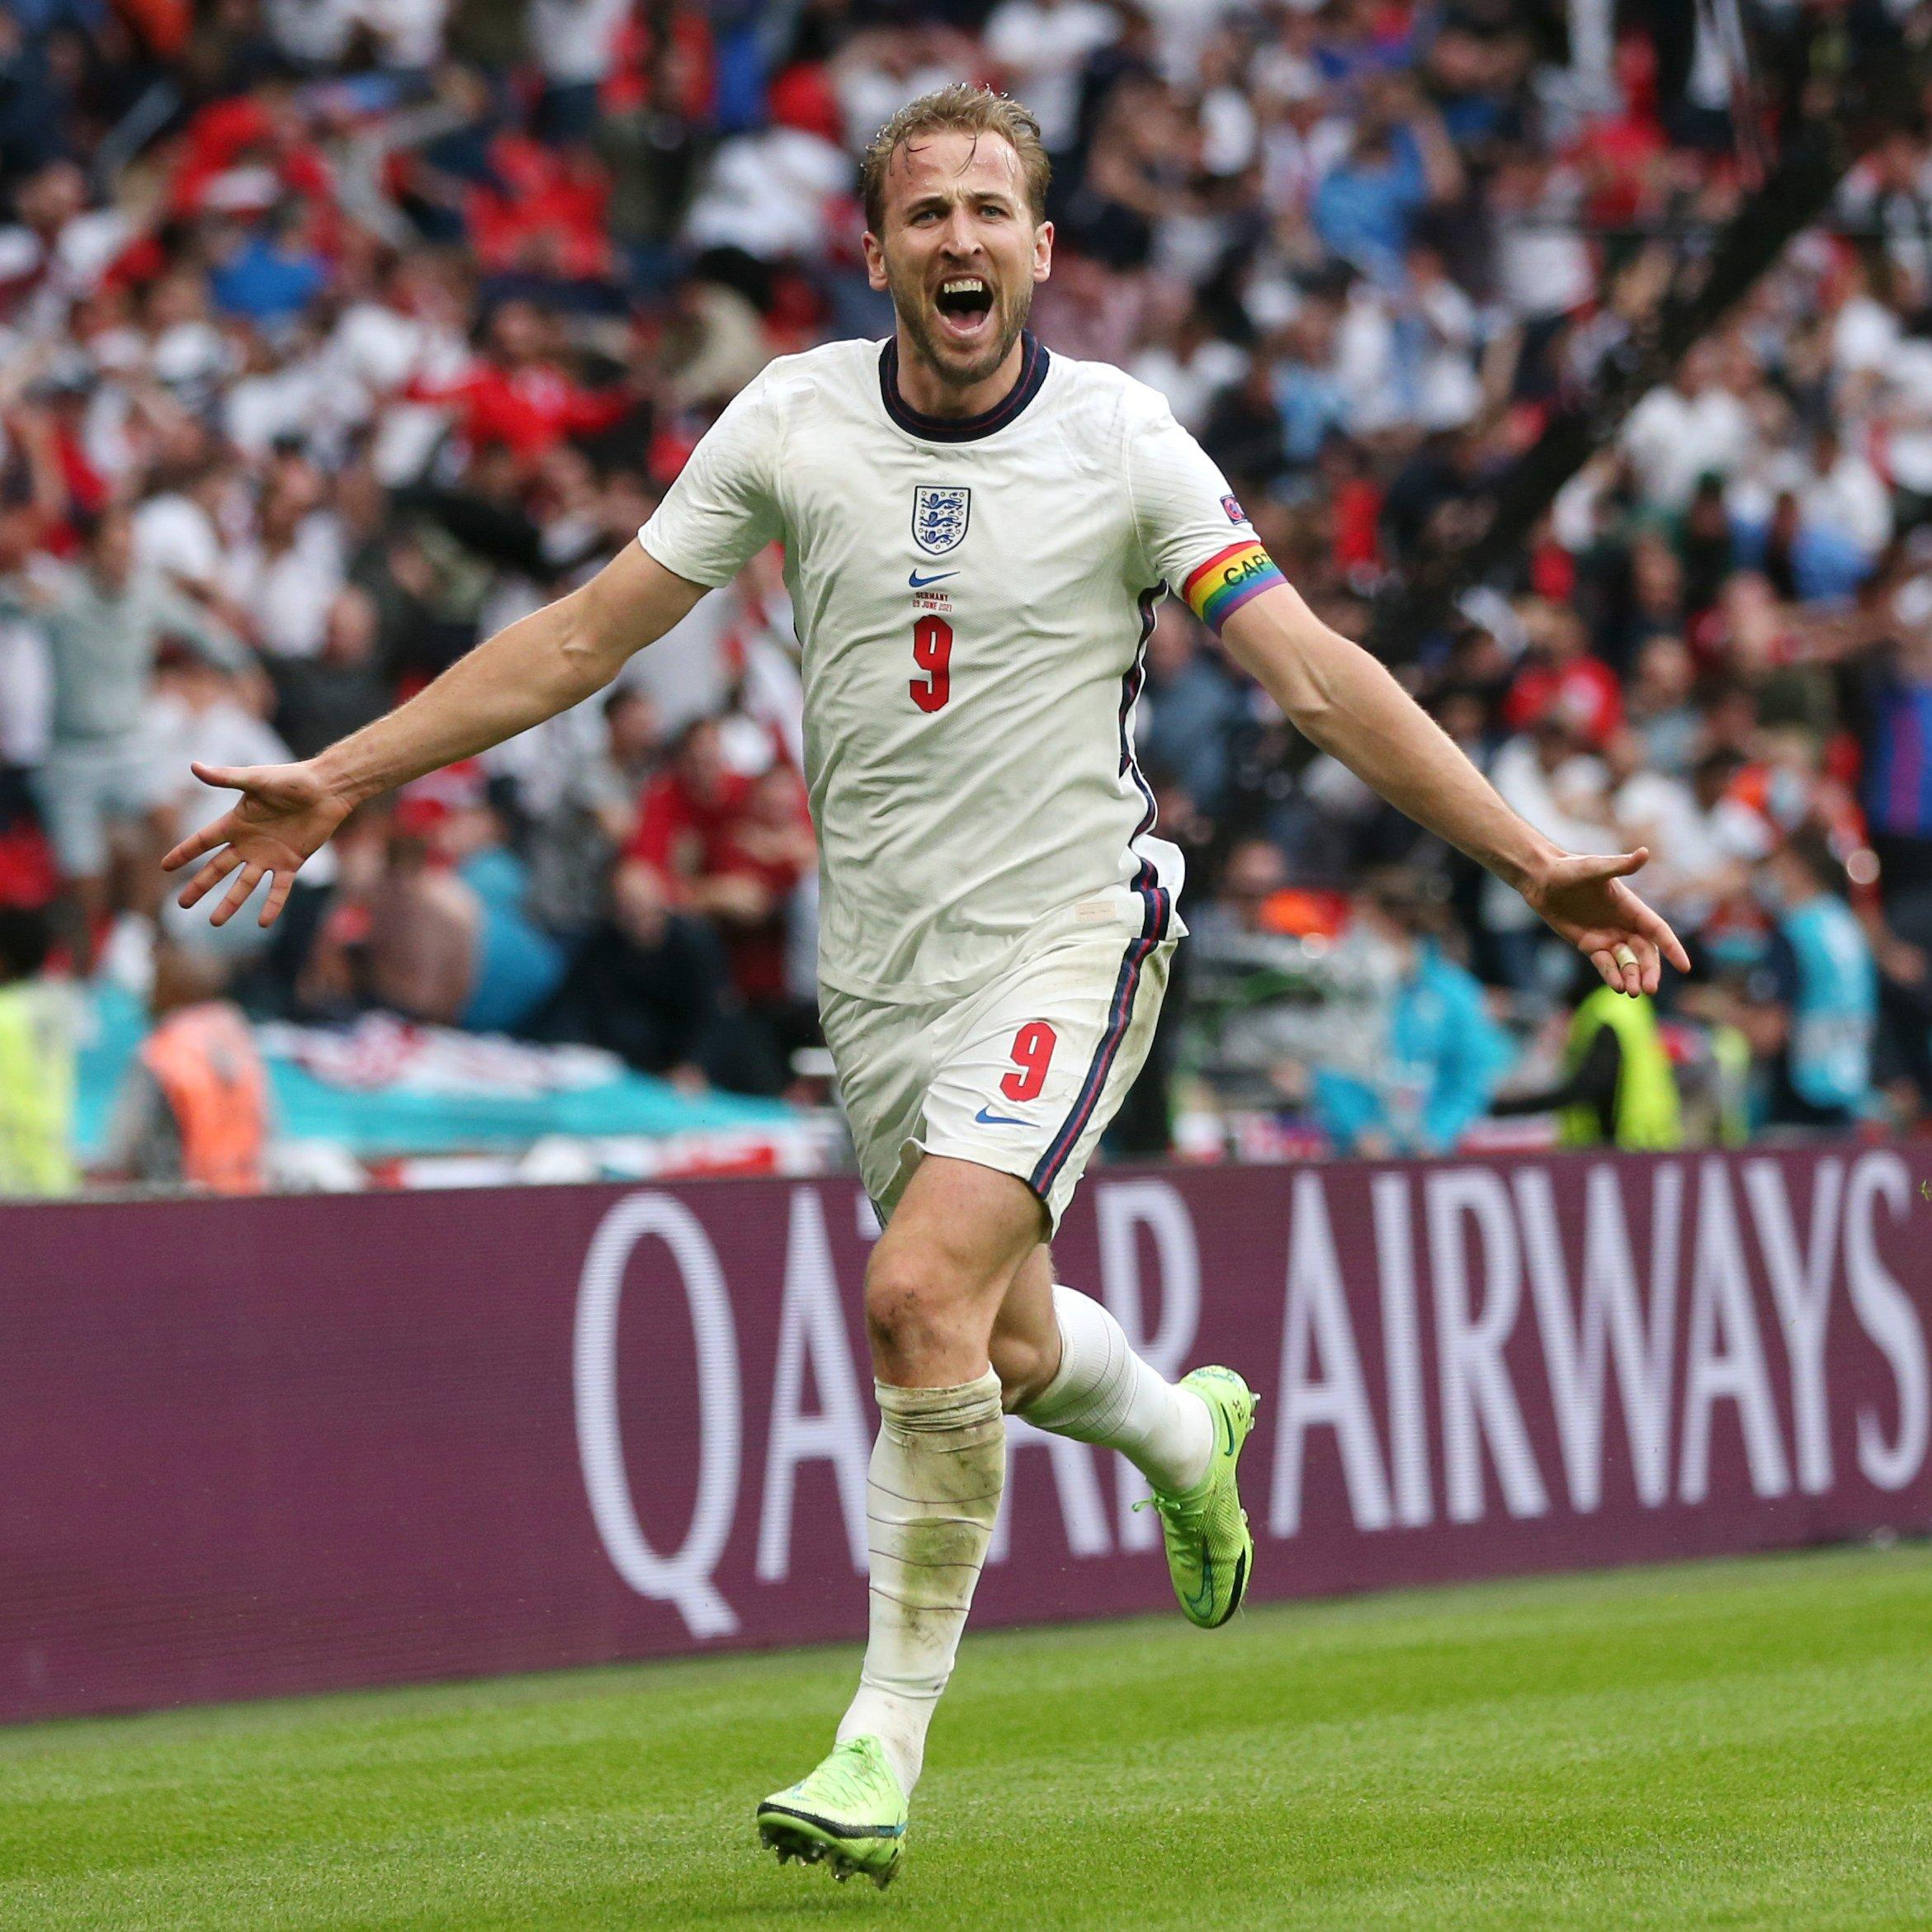 Inglaterra vence a Alemanha e se classifica na Eurocopa